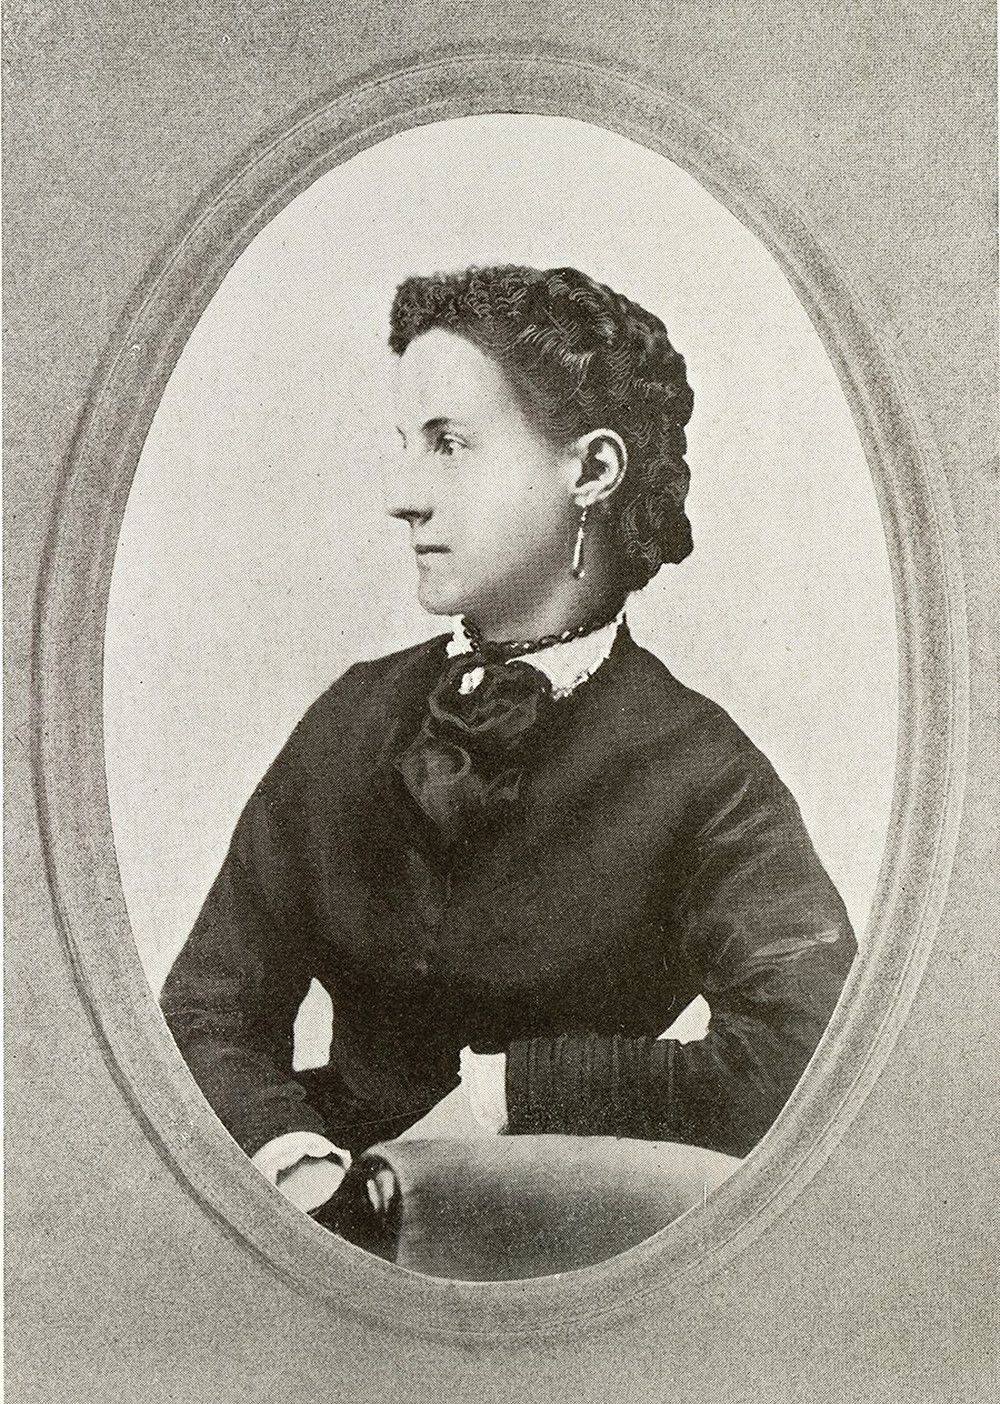 Photo: Prime_Corneilia-Prime-Huntington-Historical-Society